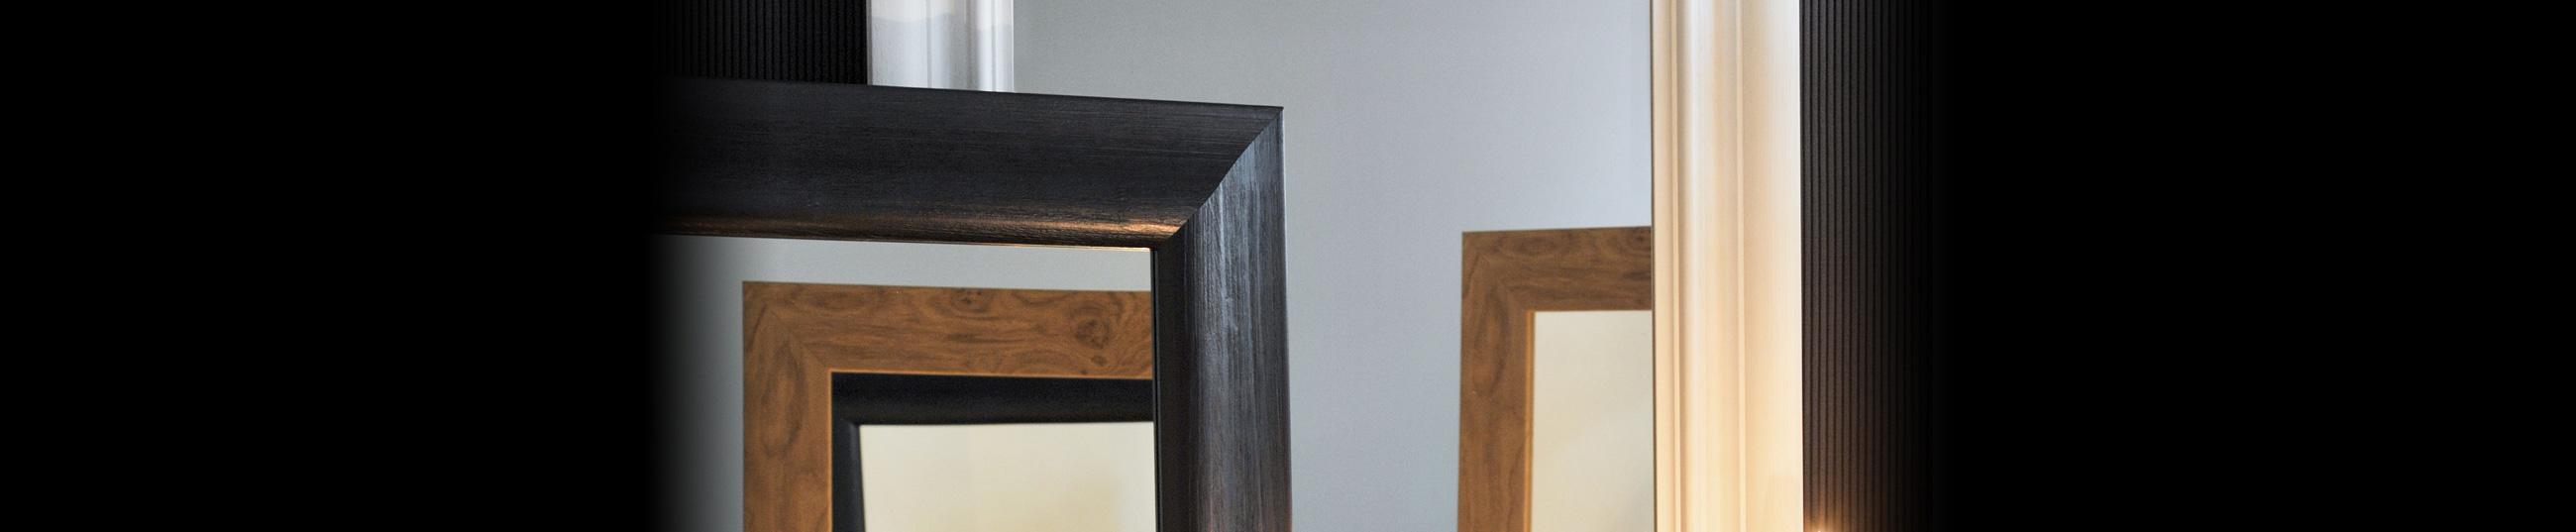 miroirs sur mesure l 39 clat de verre. Black Bedroom Furniture Sets. Home Design Ideas